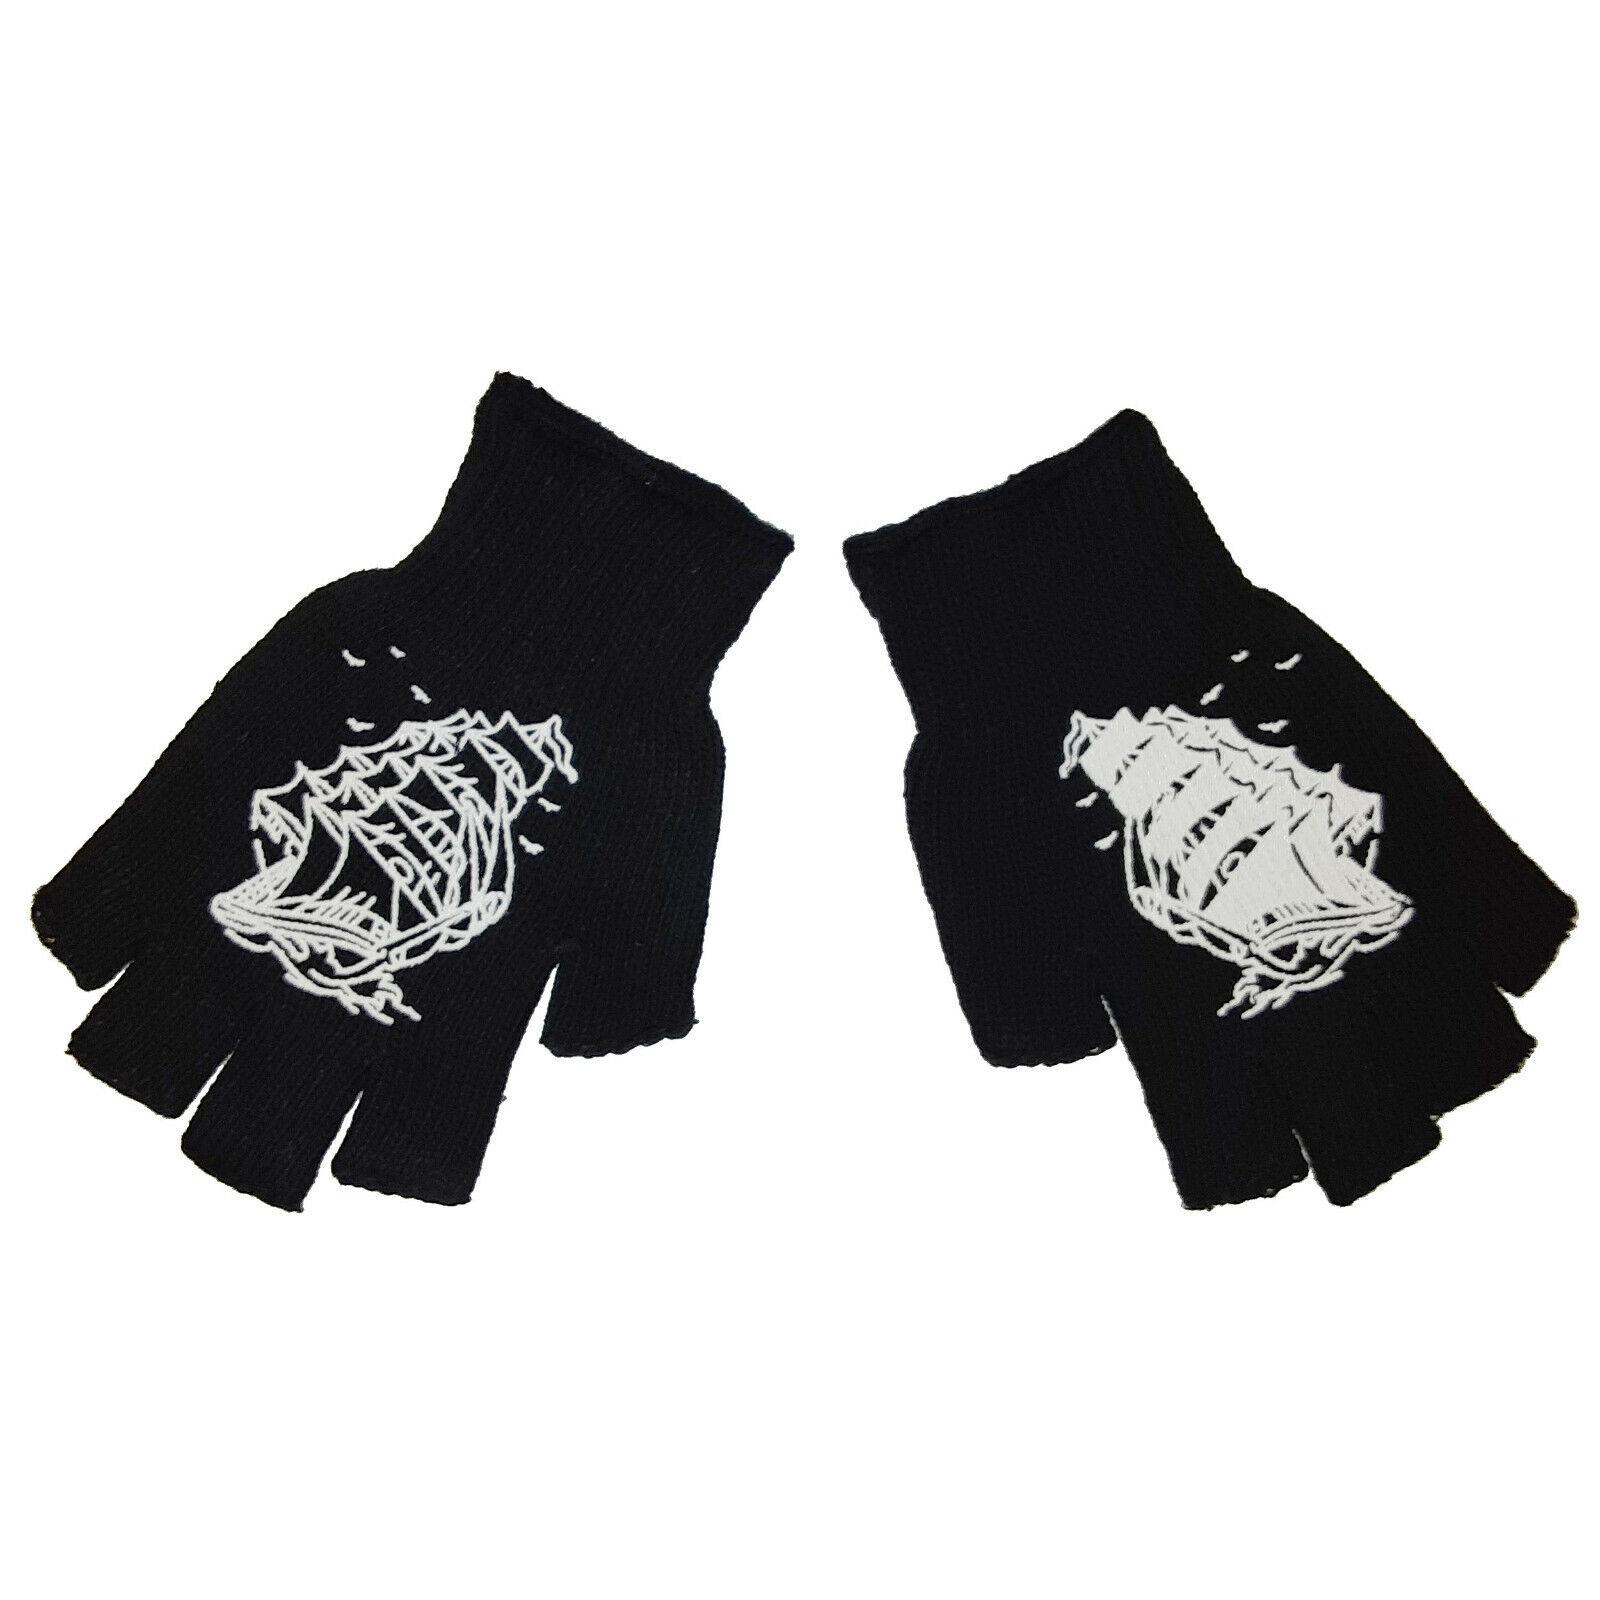 Rockabilly Punk Horror Goth Pirate Ship Gothic Mens Black Fingerless Work Gloves